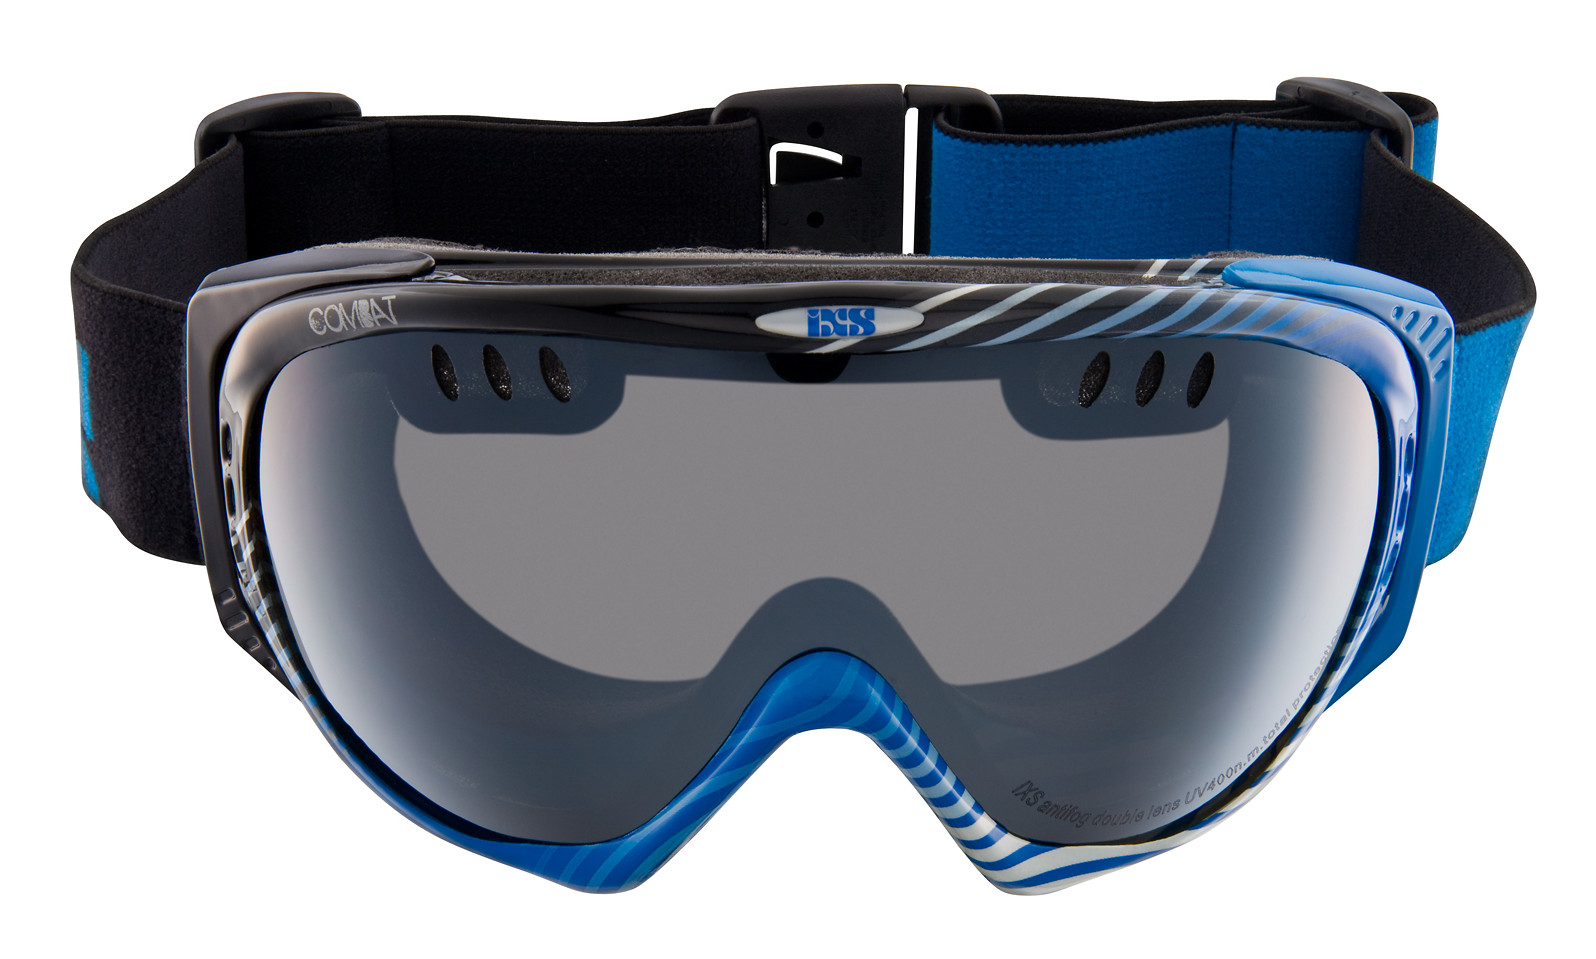 iXS Combat-Slide Goggles comat slide blue 1